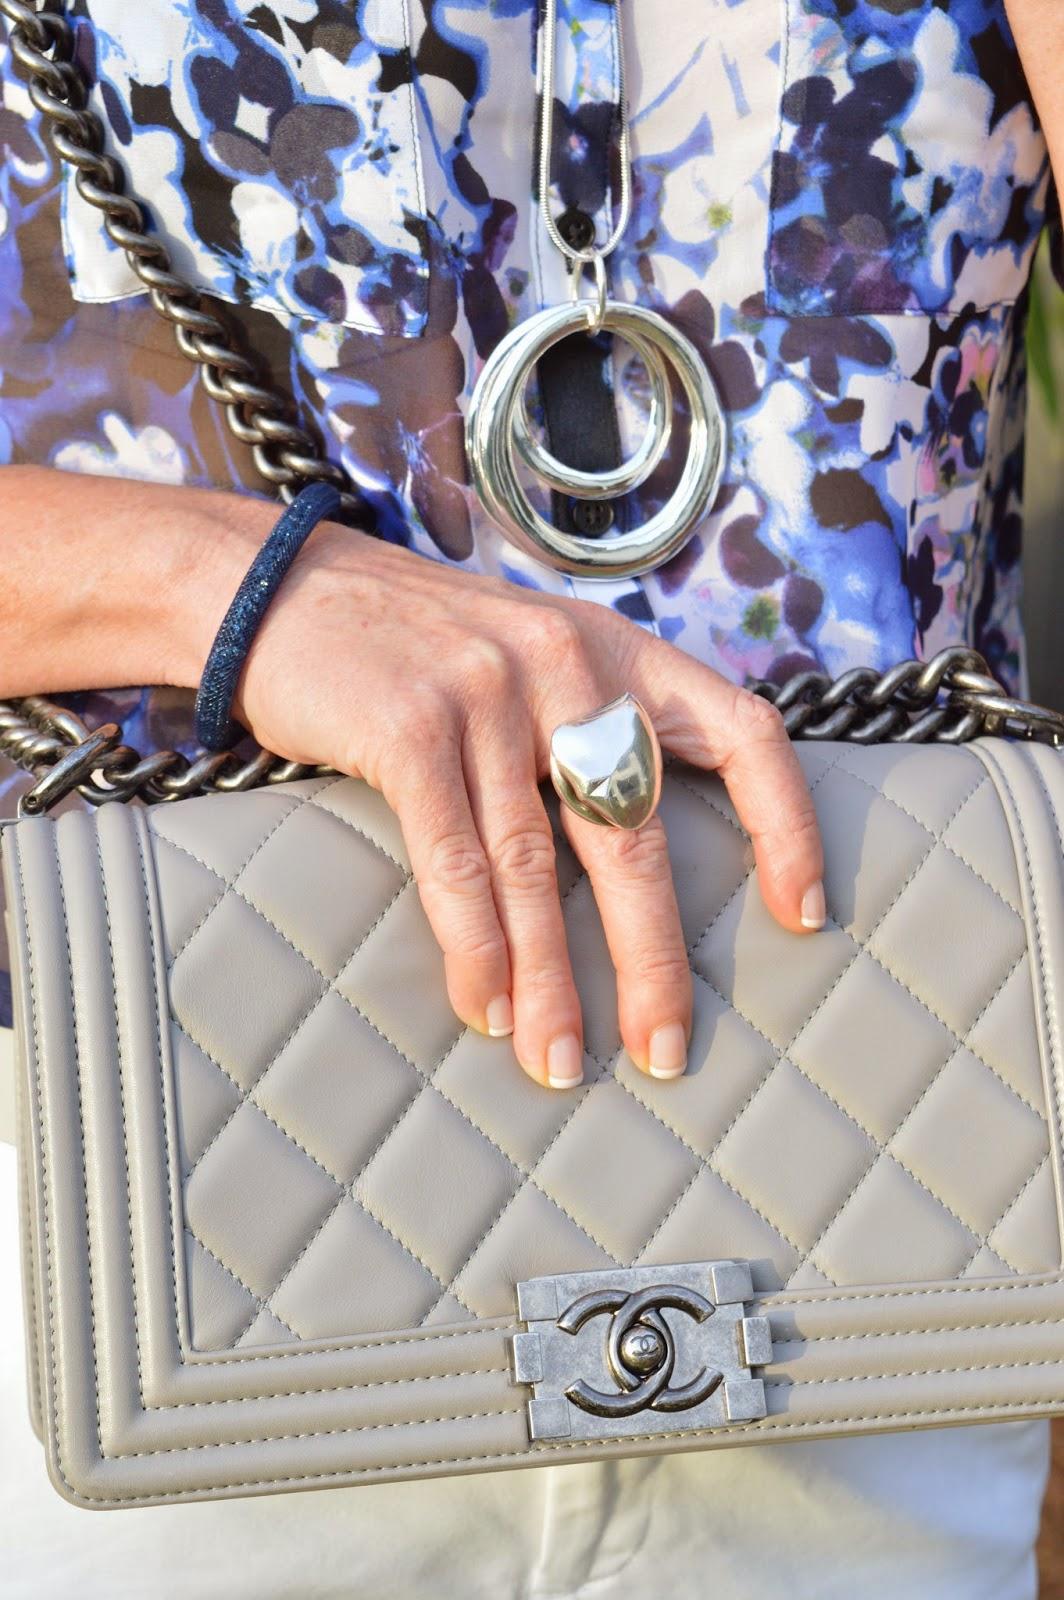 Grey Chanel Bag Swarovski Bracelet Georg Jensen Heart Ring